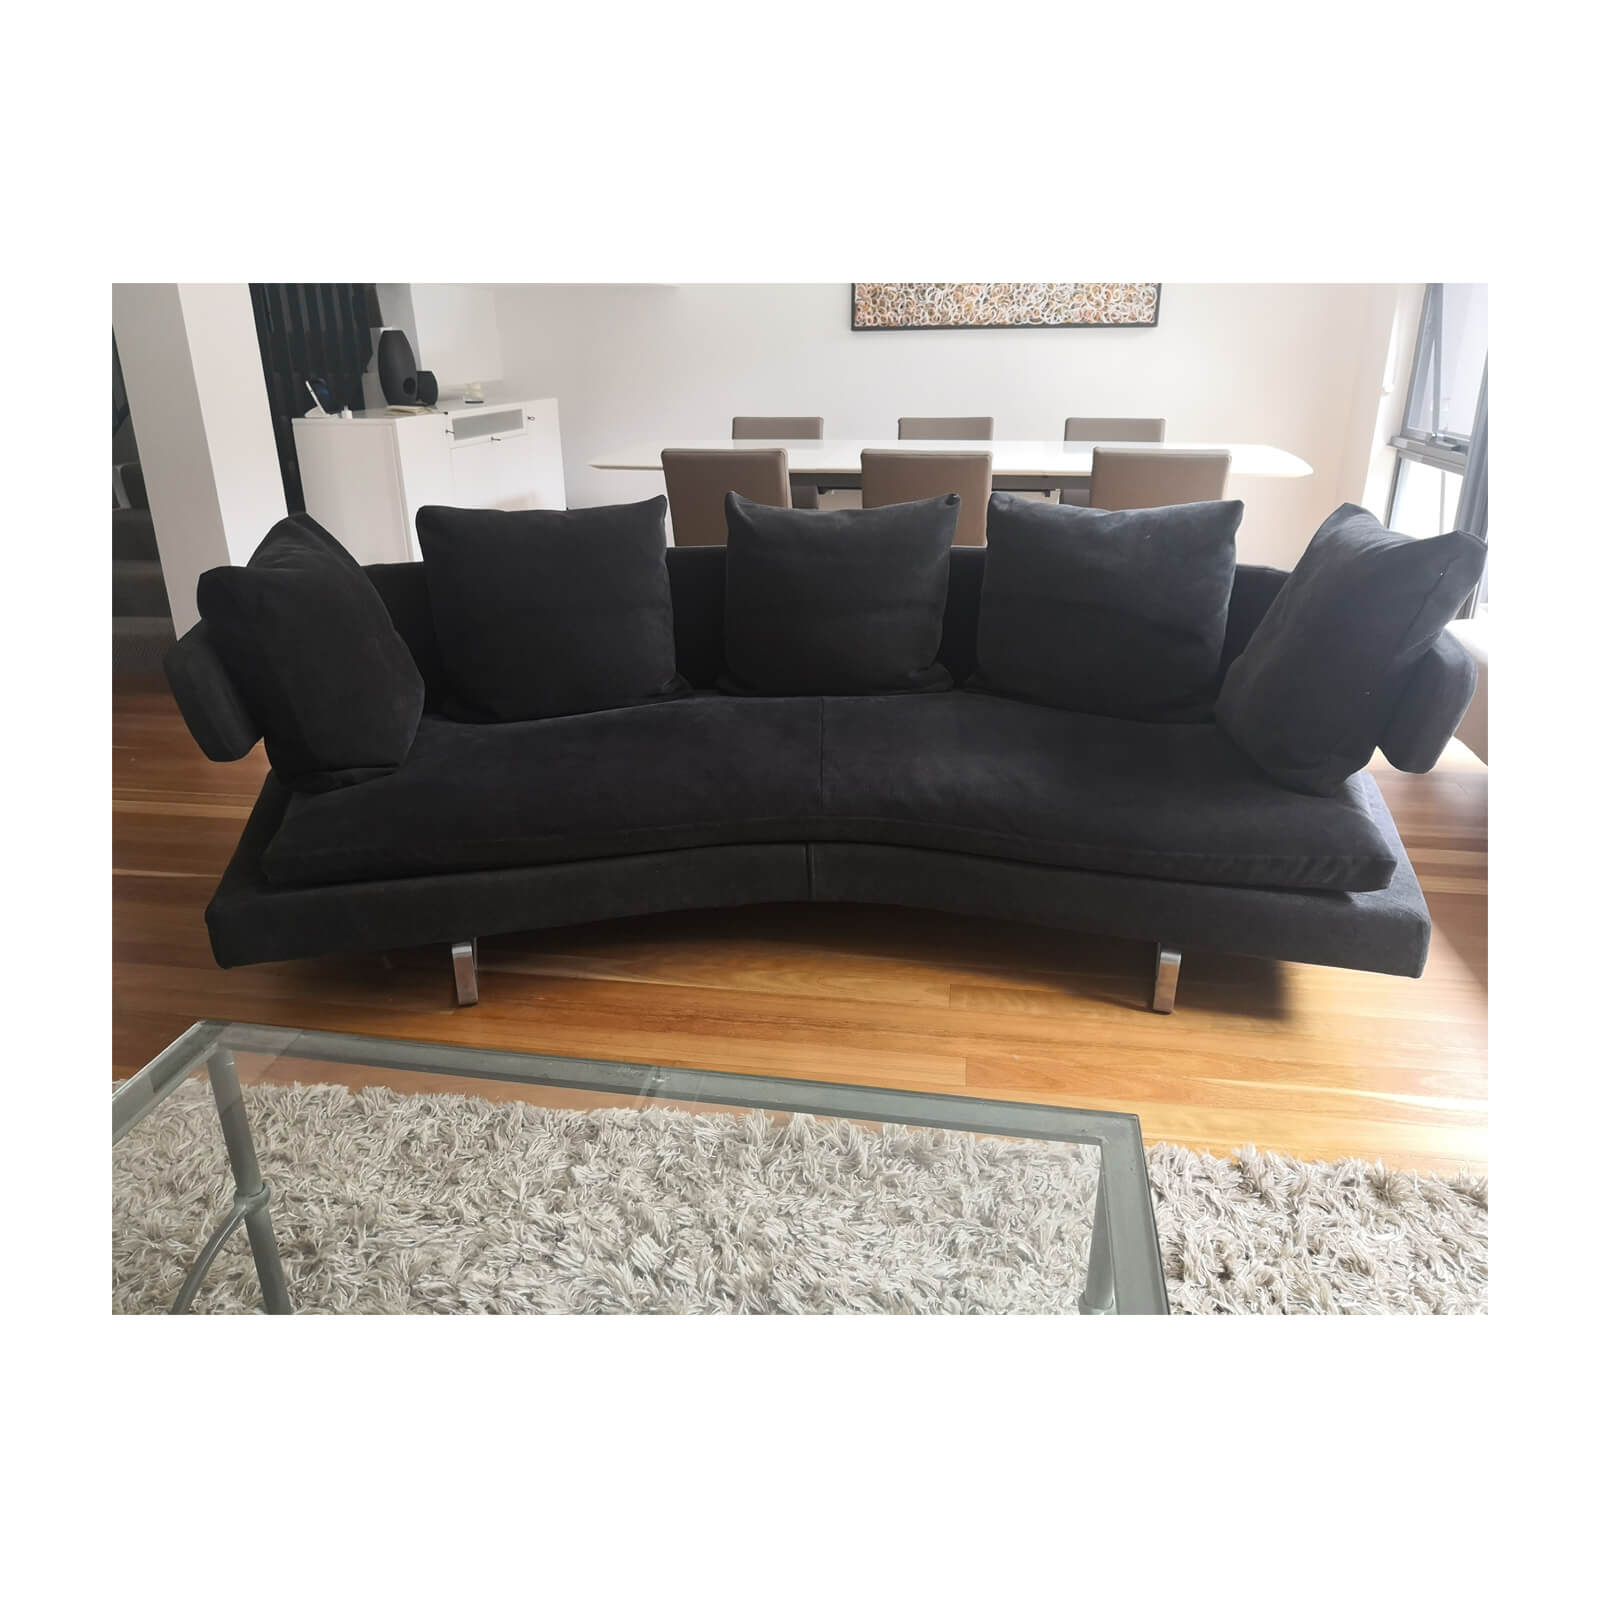 Two Design Lovers B&B Italia Arne sofa anthracite front